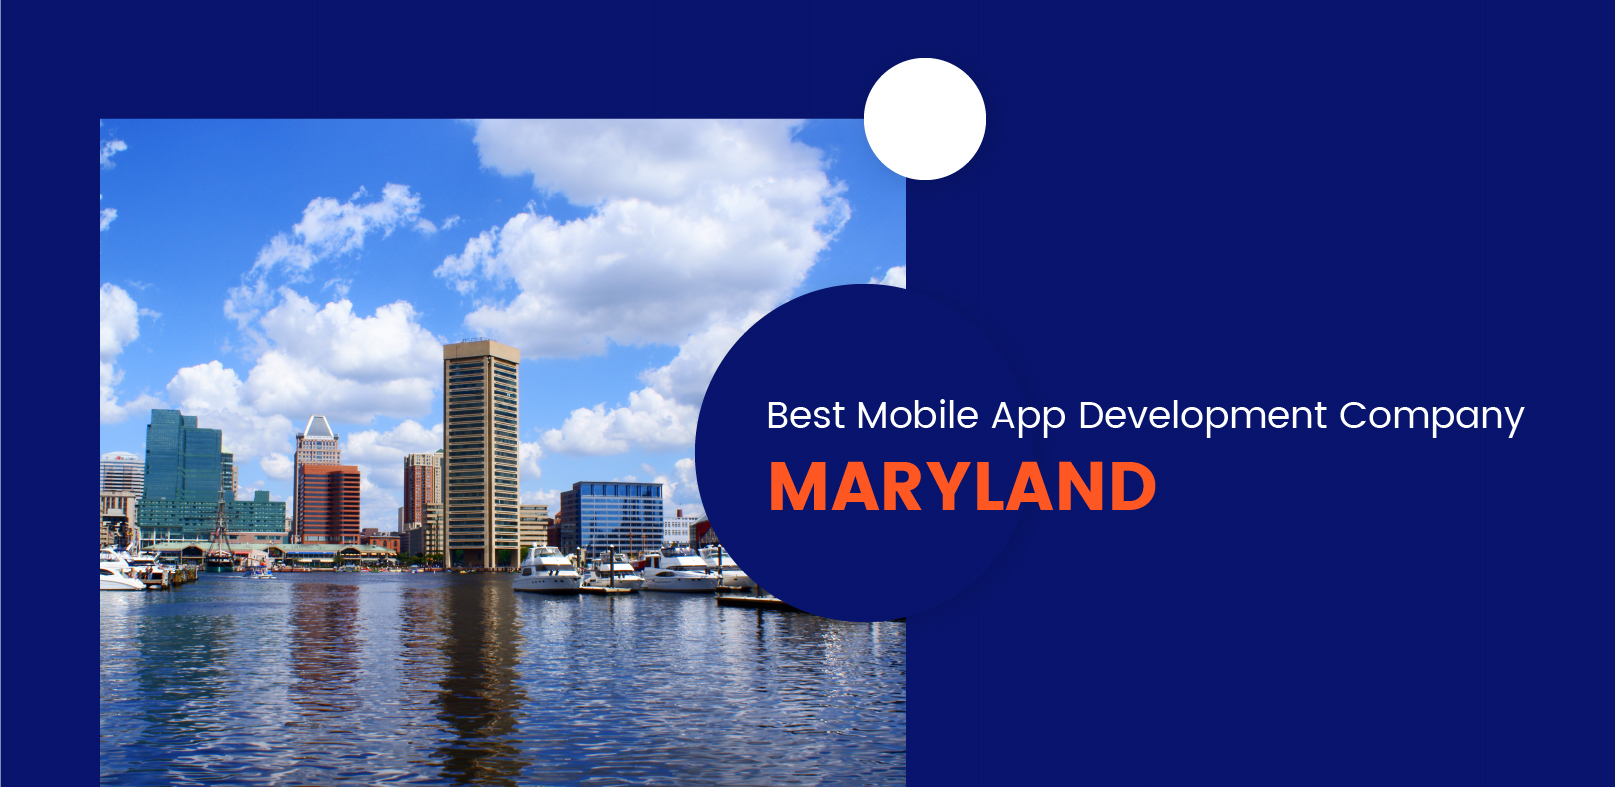 BEST MOBILE APP DEVELOPMENT COMPANY IN MARYLAND - WebClues Infotech